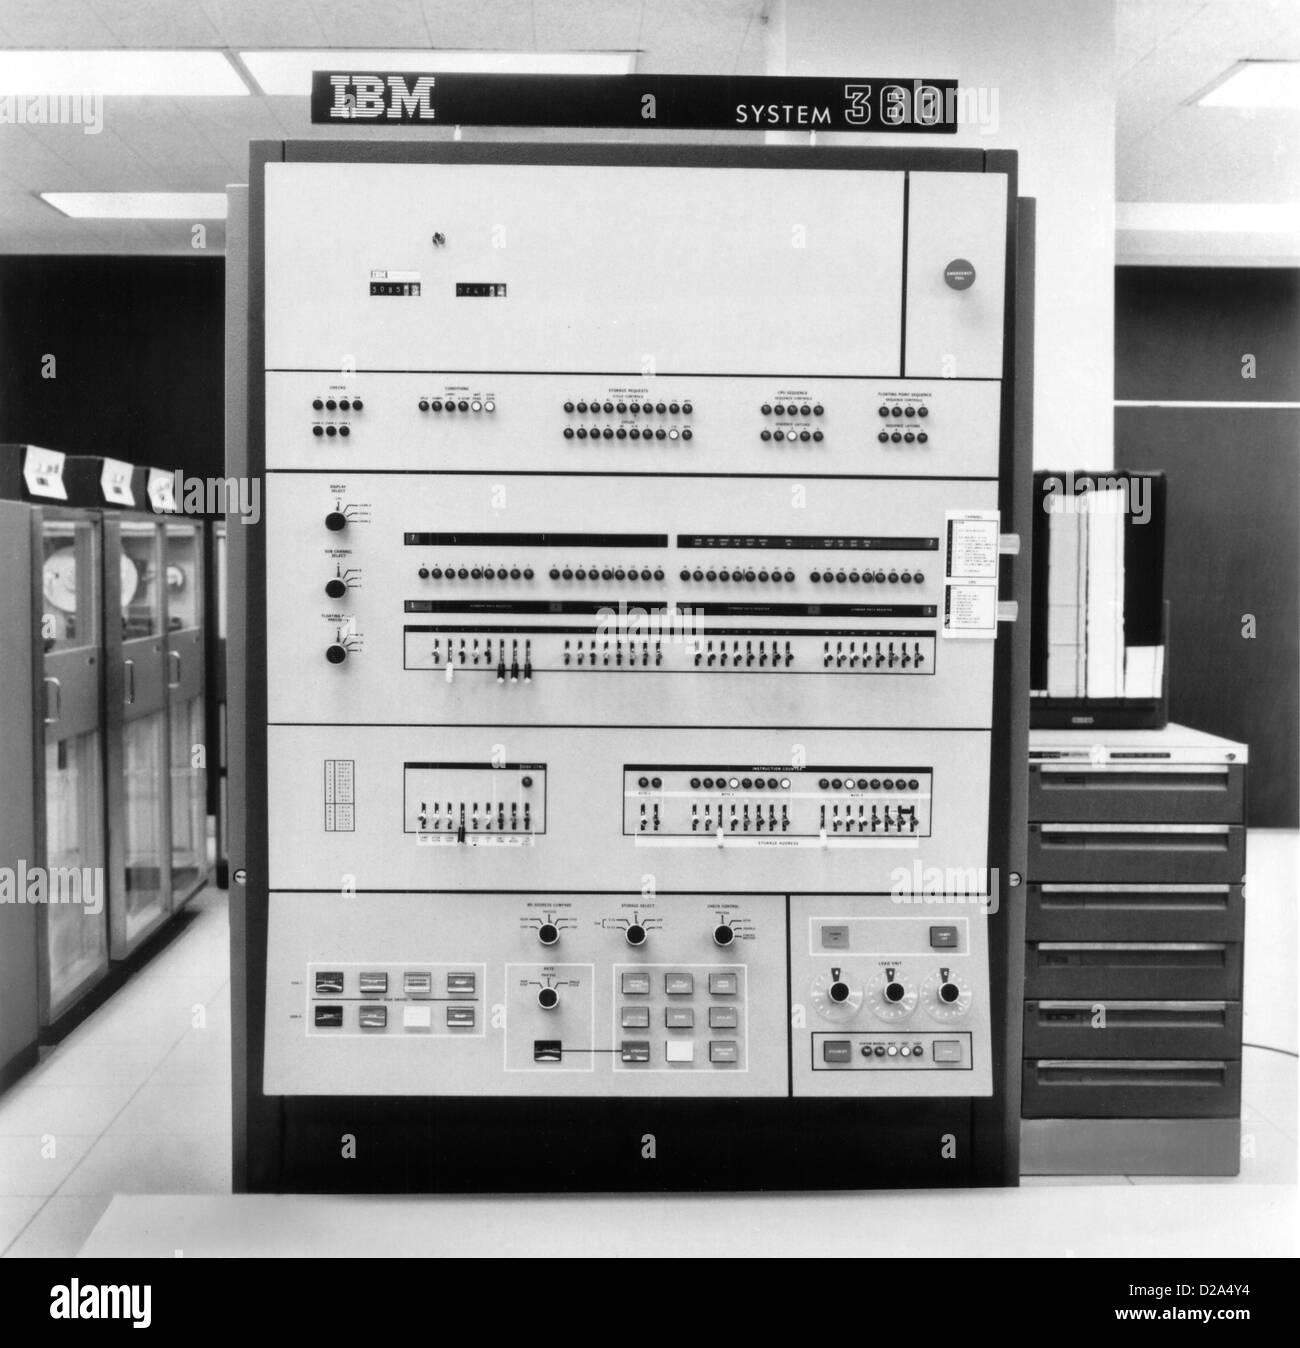 Ibm 360 Mainframe Computer Stock Photo: 53083832 - Alamy